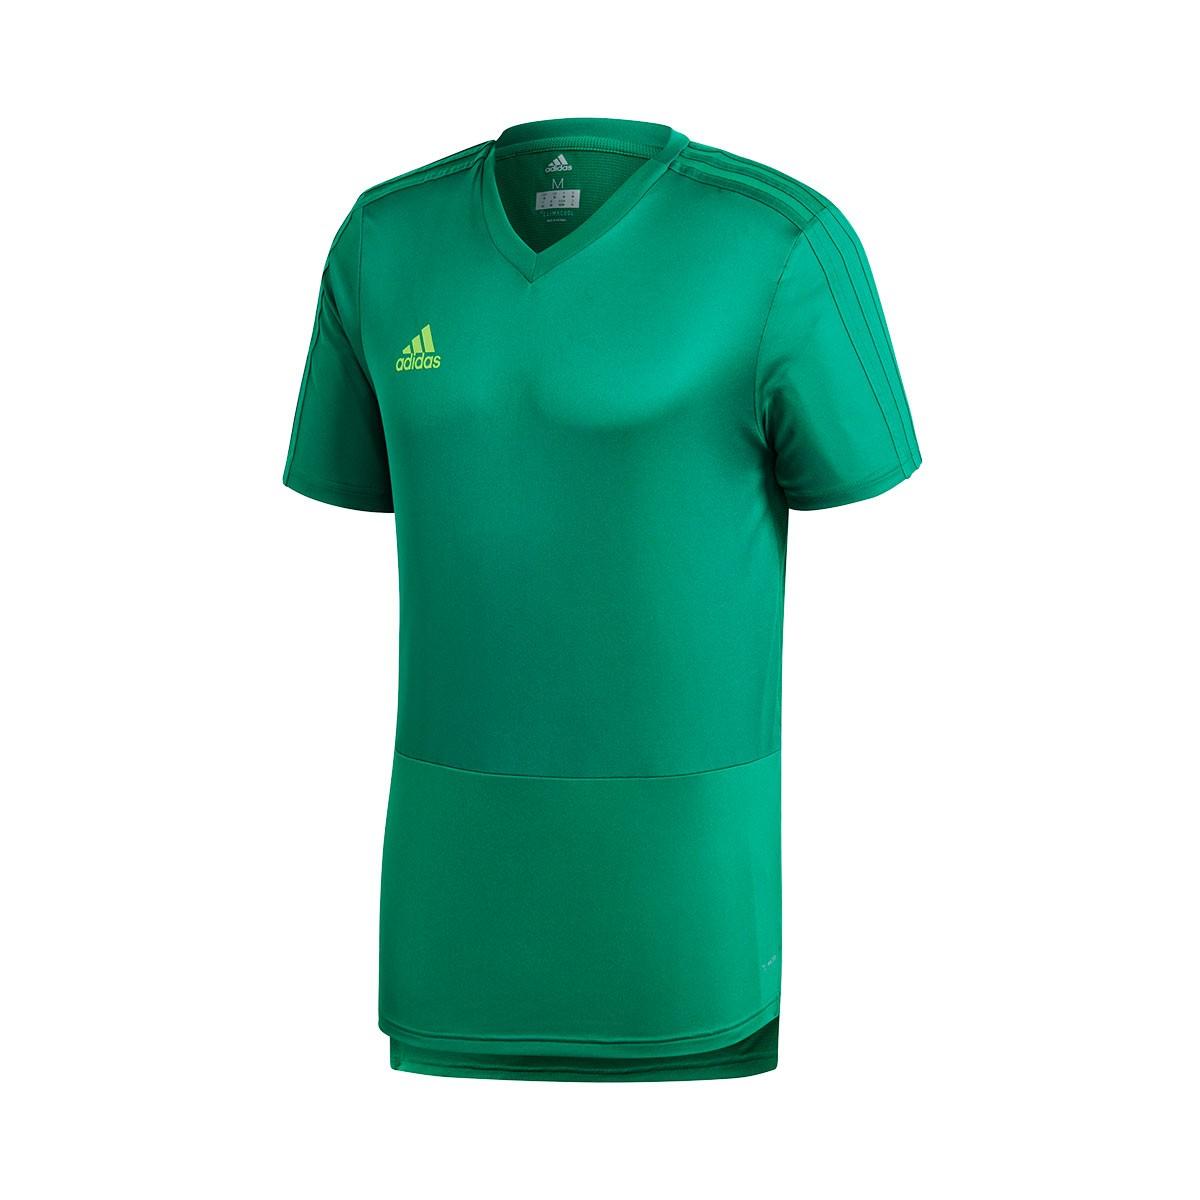 97dbccbe90e Jersey adidas Condivo 18 Training m c Bold green-Solar green ...